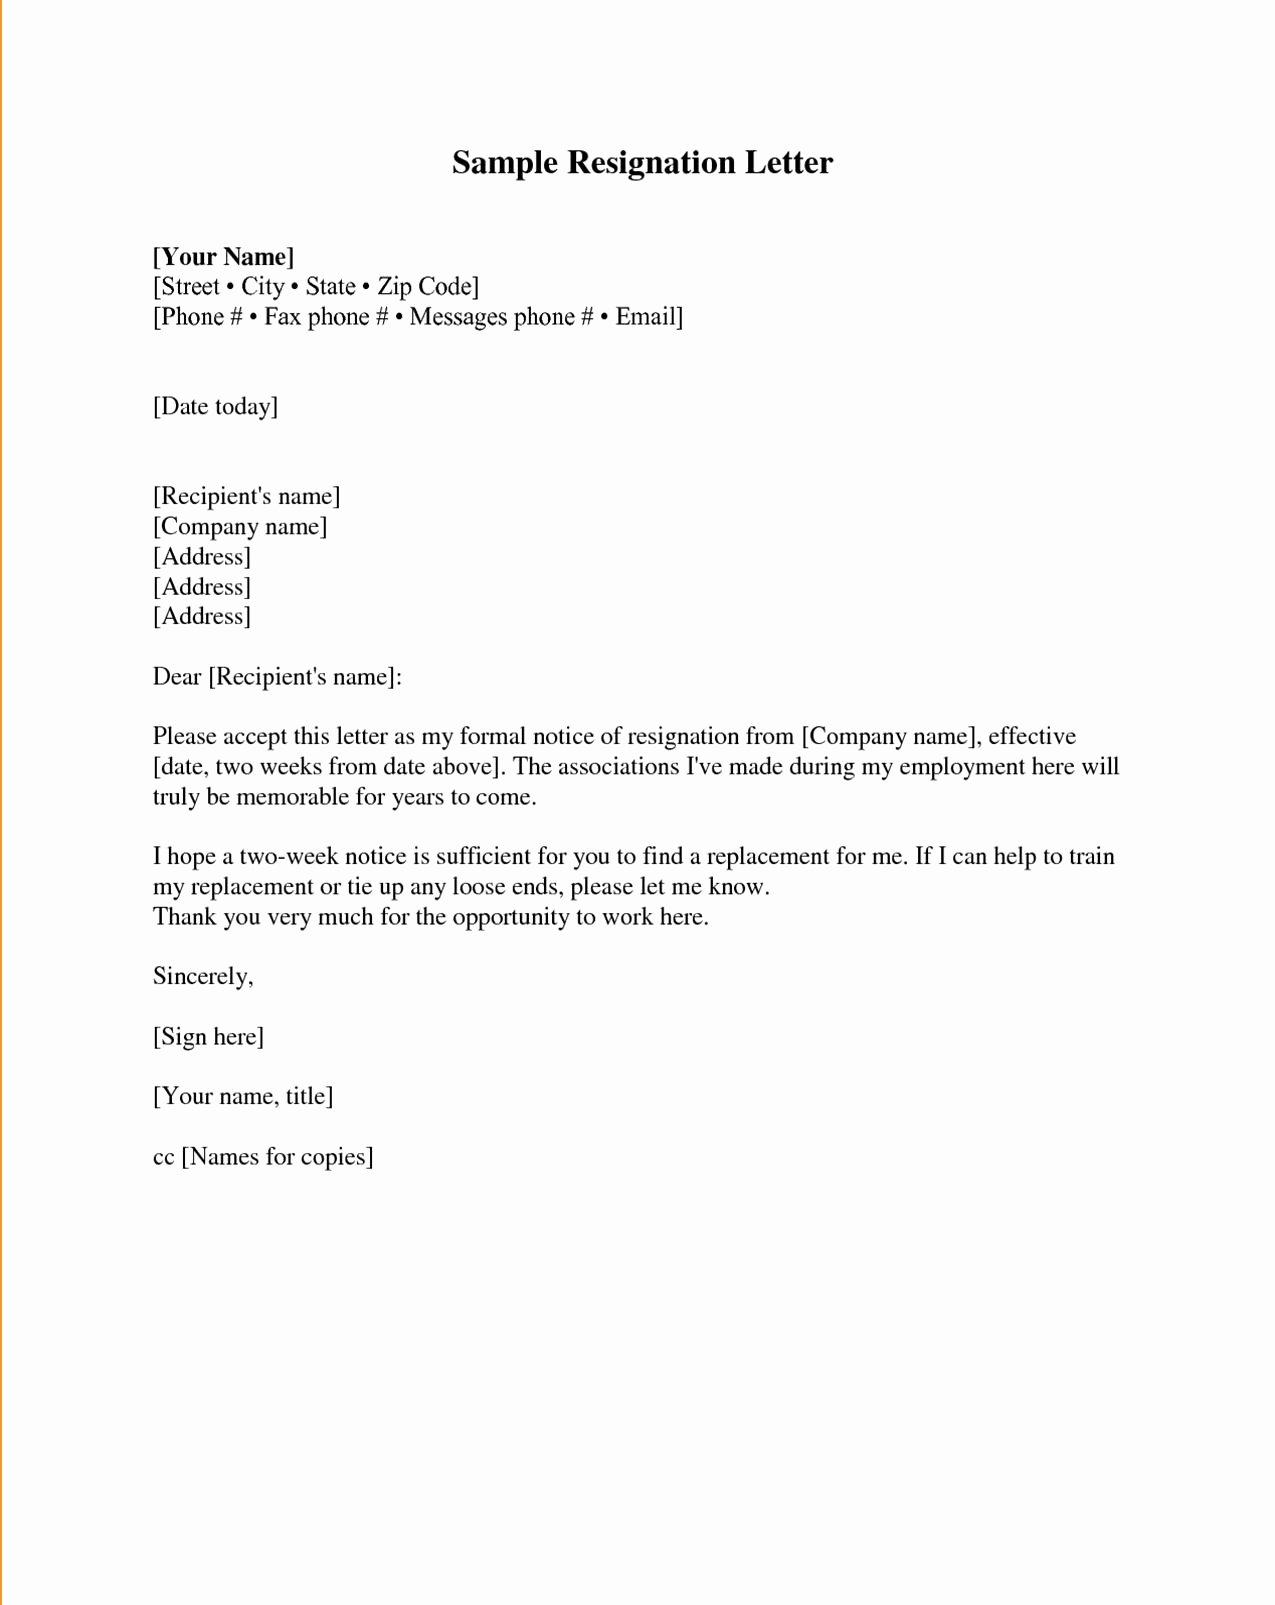 Resignation Letter Sample Beautiful Resignation Letter Samples Download Pdf Doc format